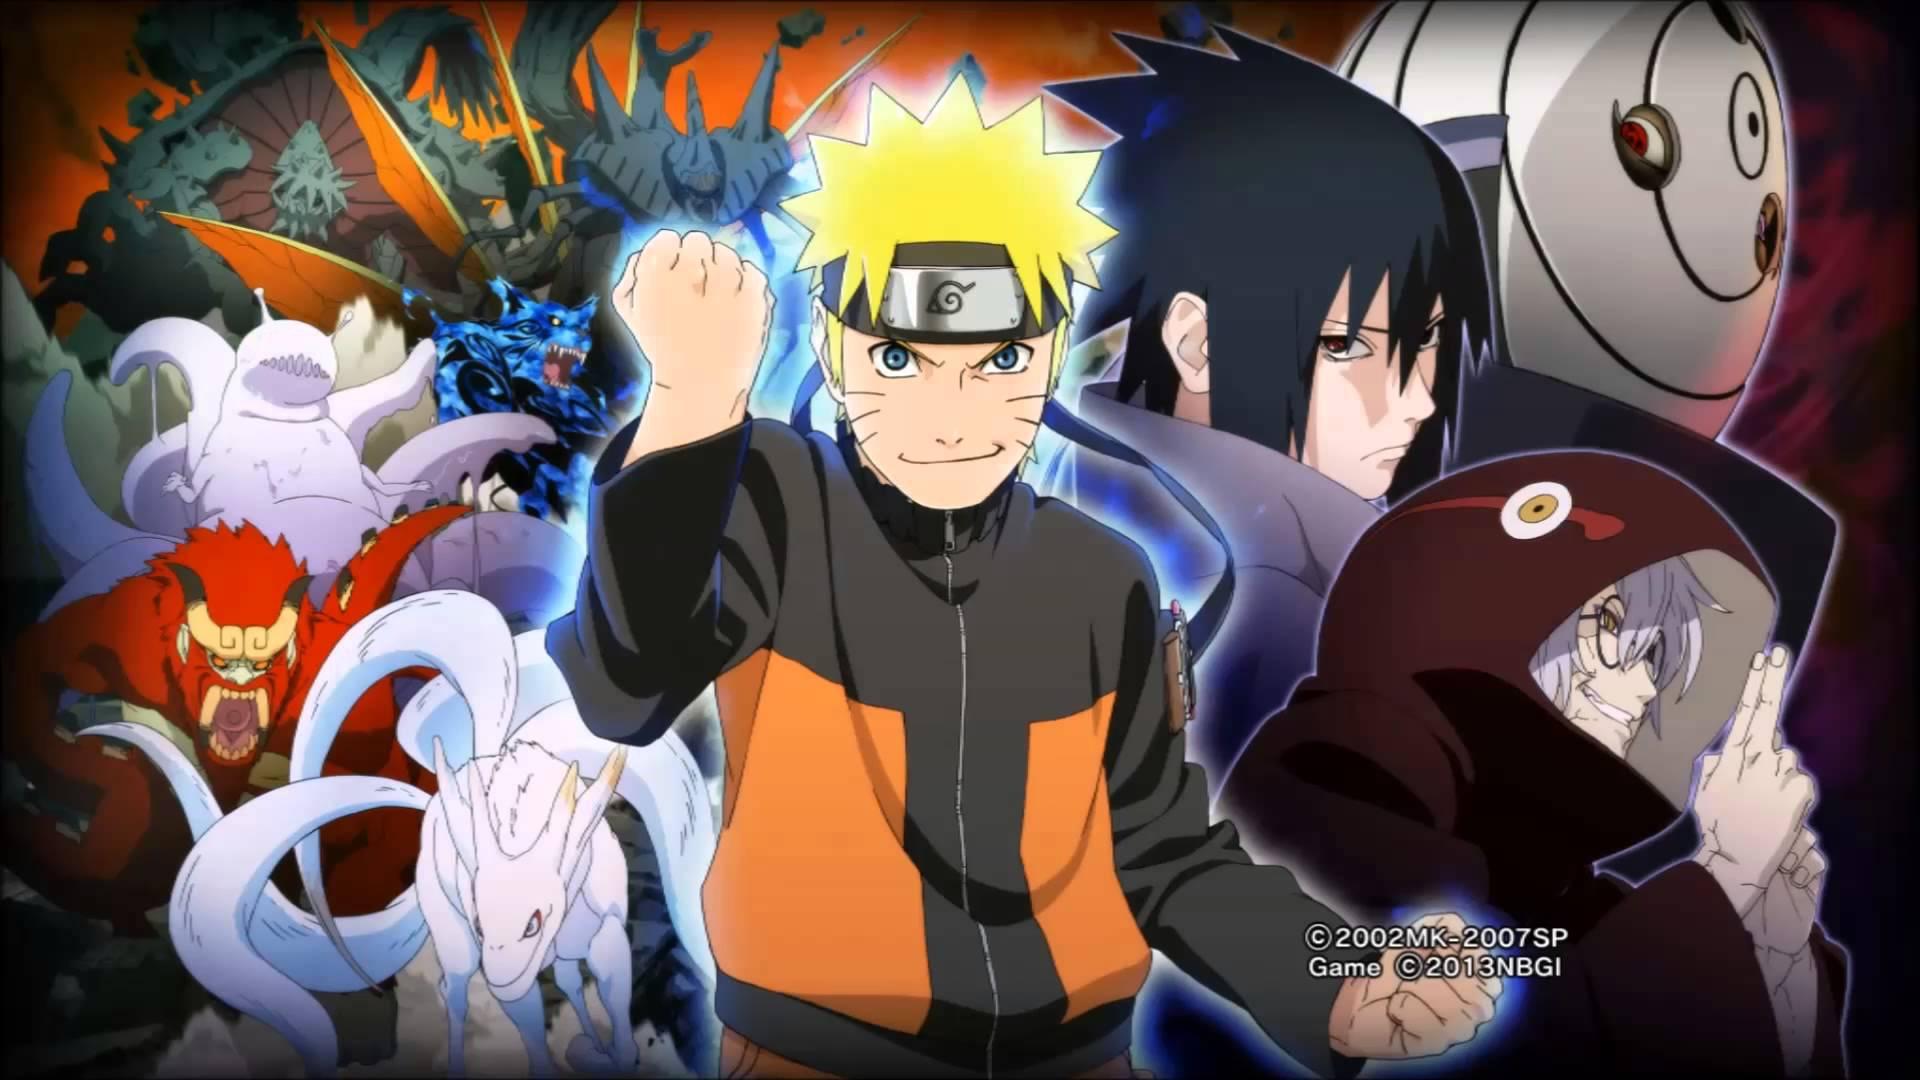 Fondos de Naruto Wallpapers HD Gratis 1920x1080